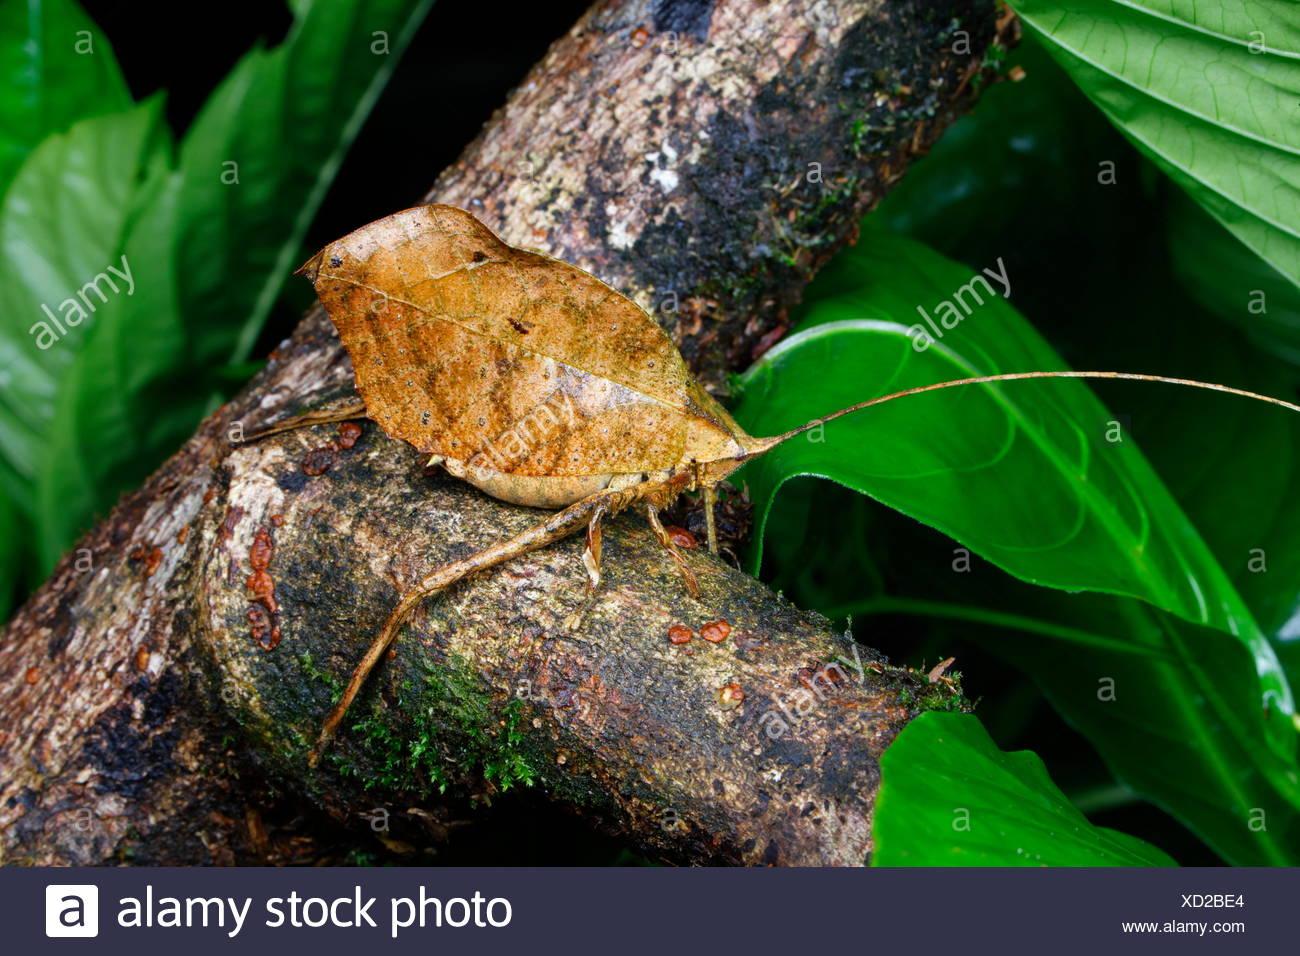 Eine Nahaufnahme von einem toten Blatt katydid nachahmen, tettigoniidae Arten. Stockbild